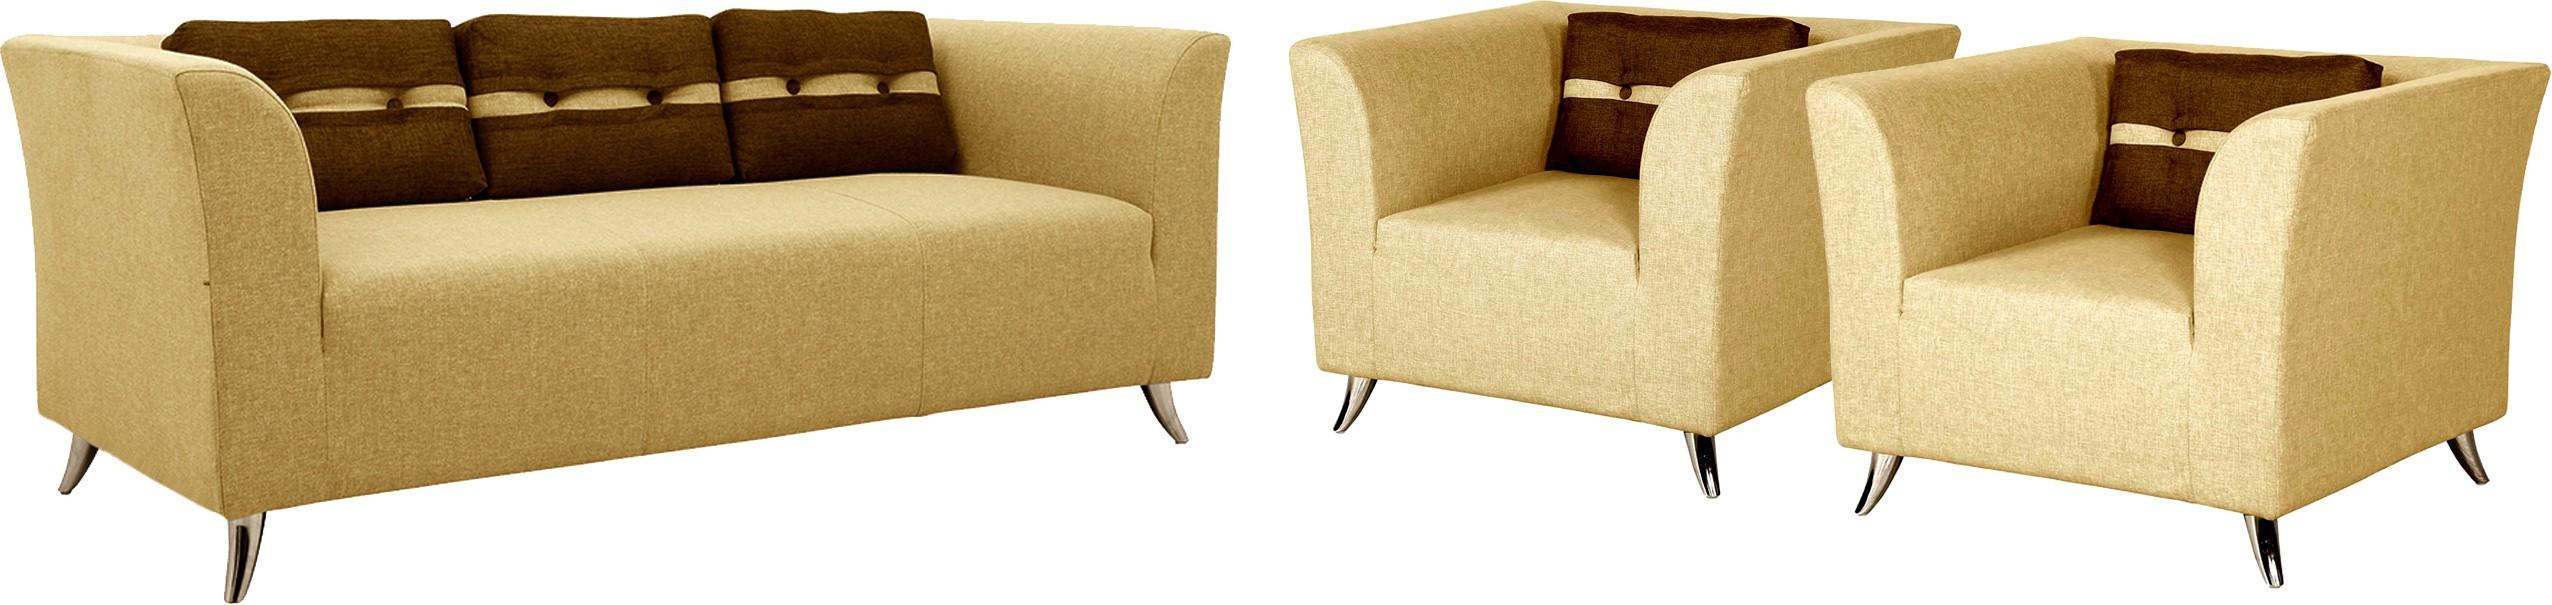 View Amey Fabric 3 + 1 + 1 Matt Sofa Set Furniture (Amey)